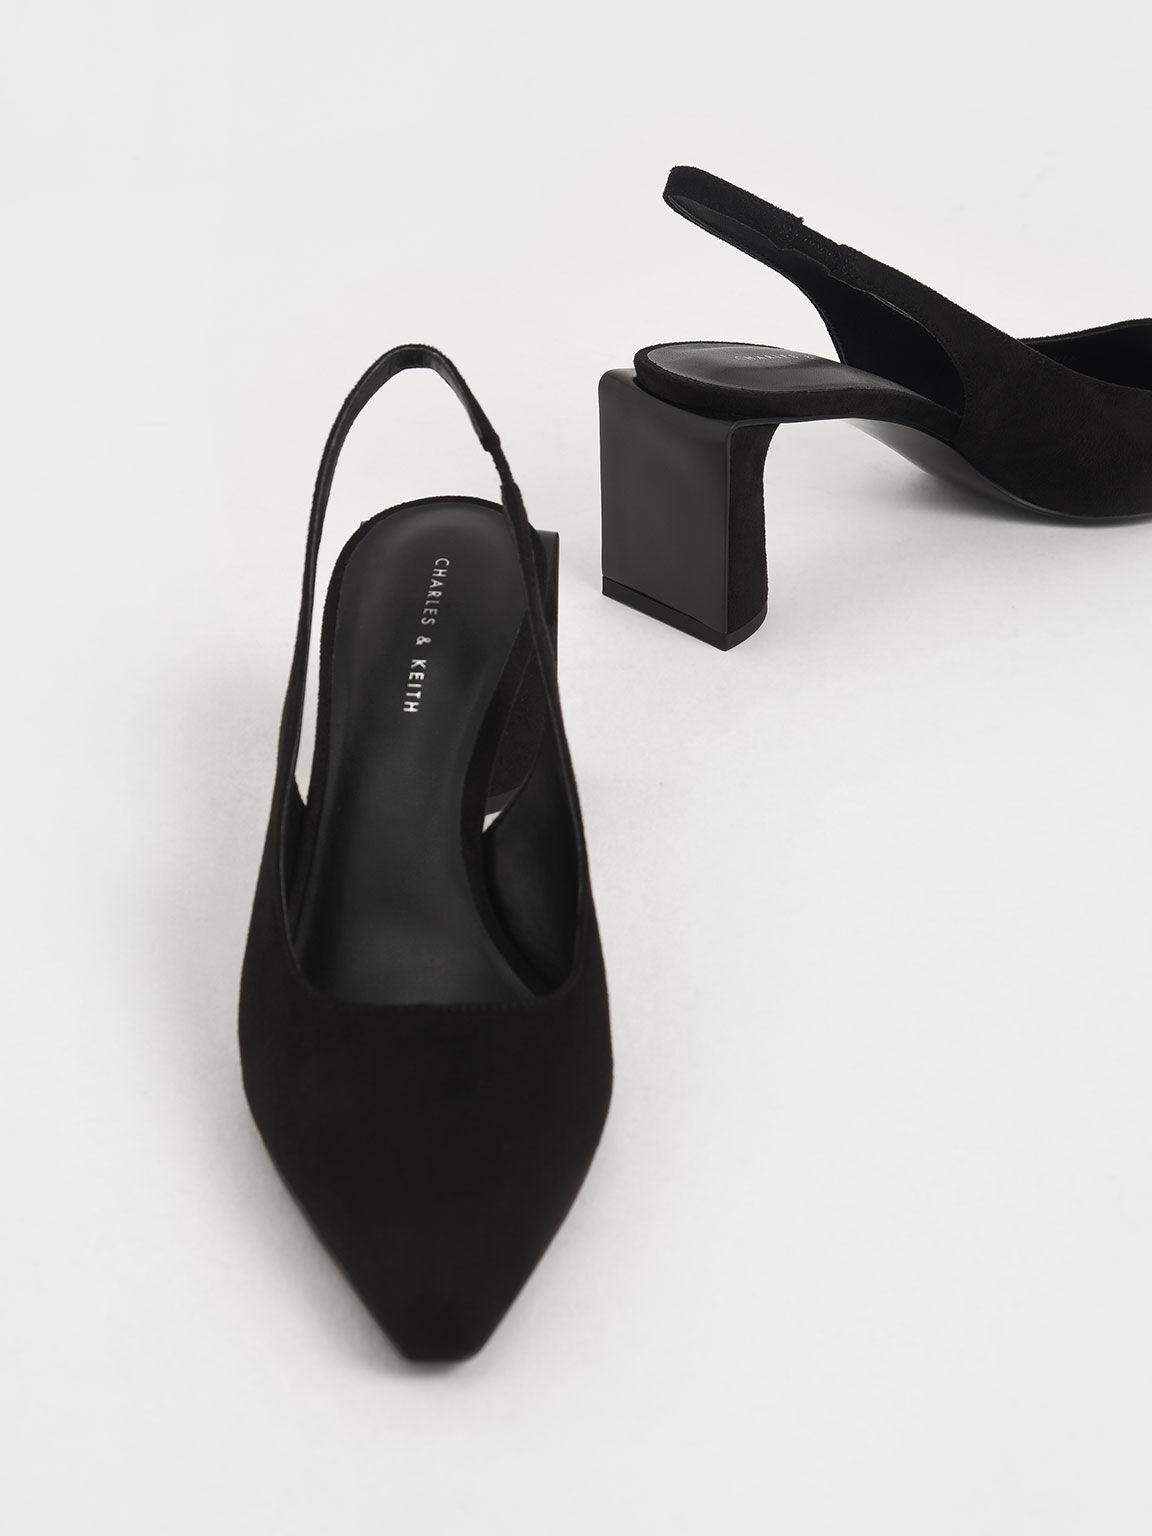 Textured Half Moon Slingback Court Shoes, Black, hi-res